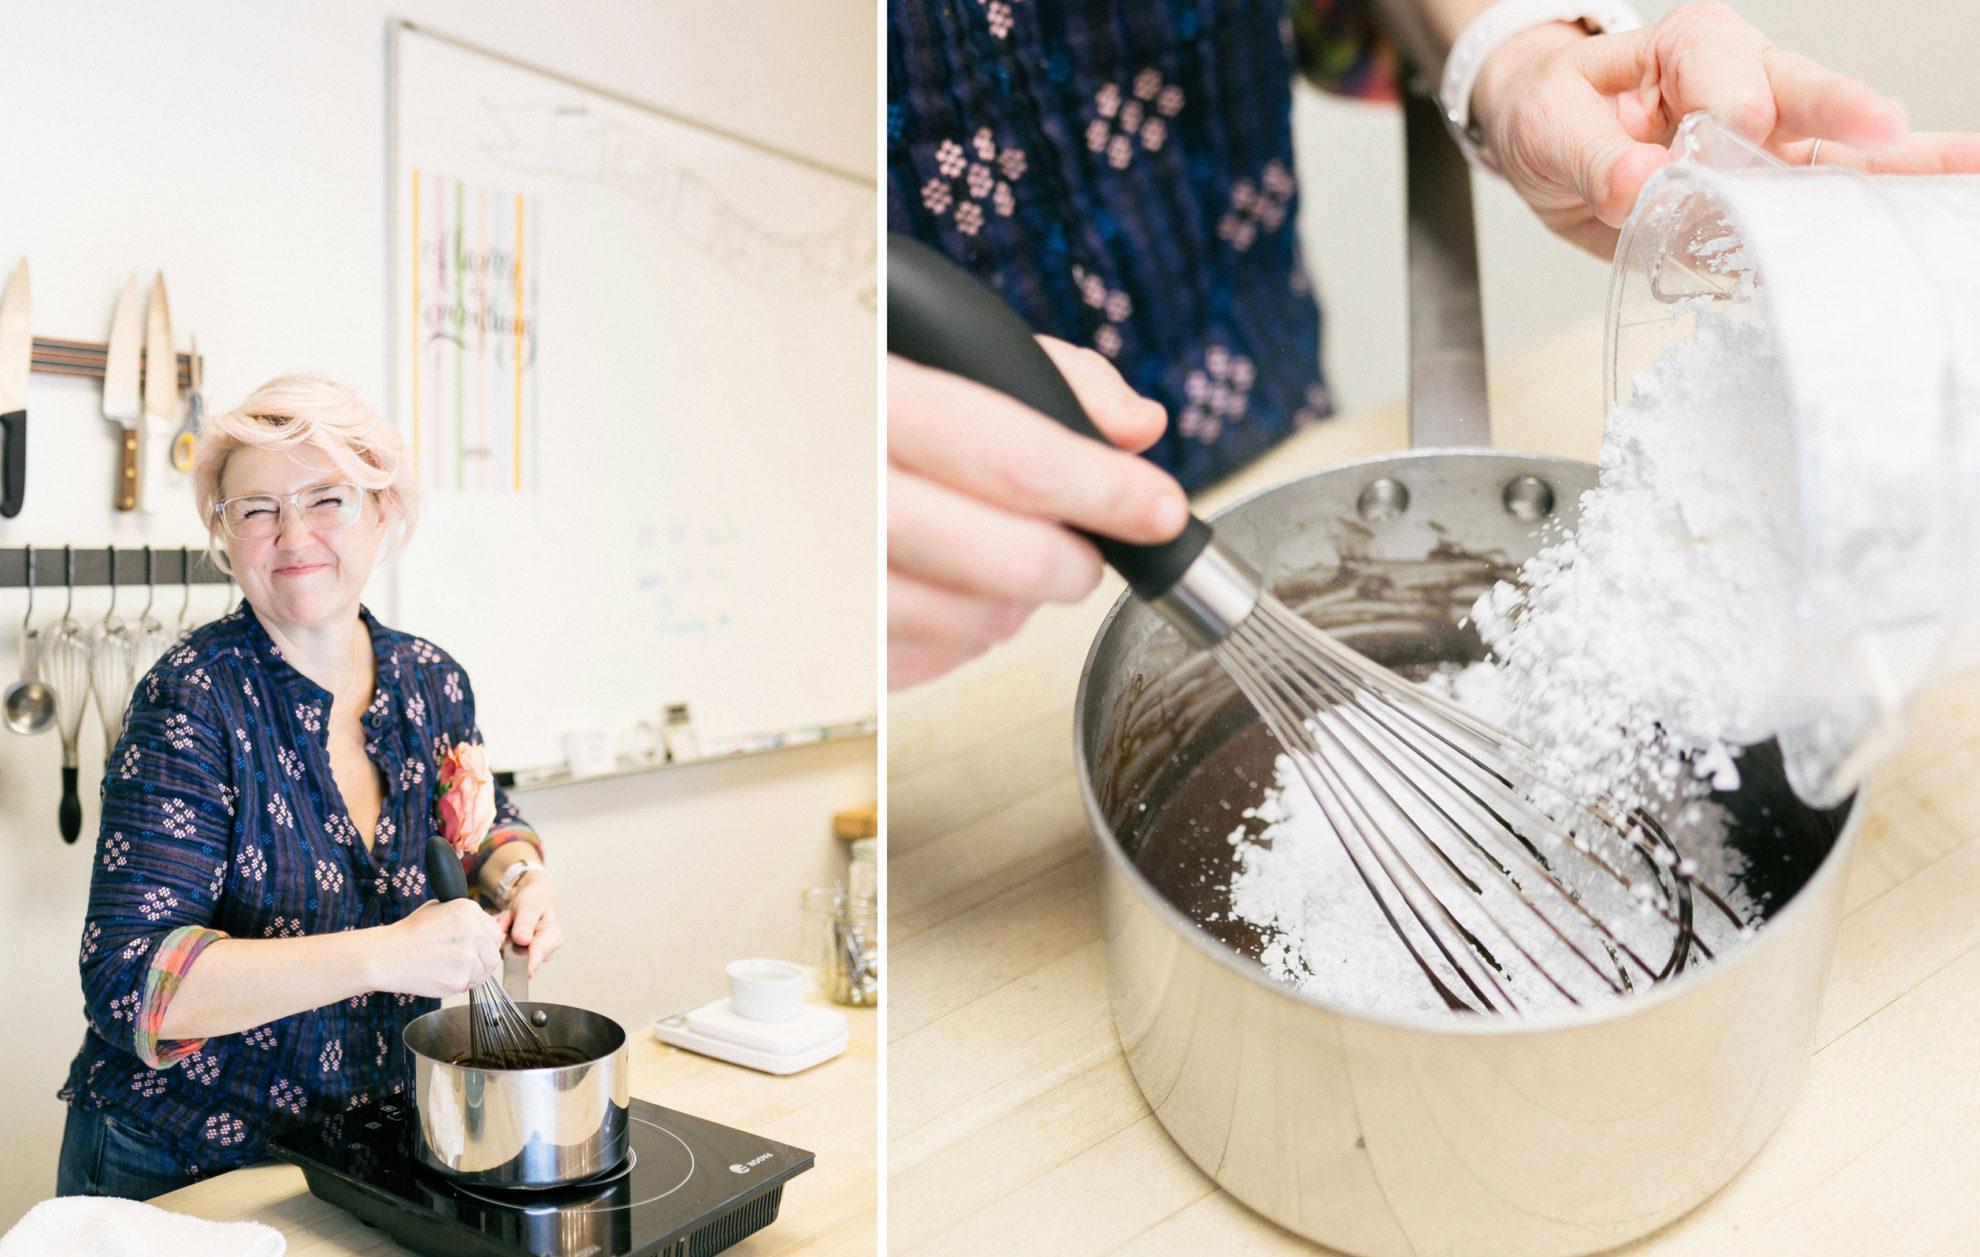 Cooking with Jeni's Ice Cream